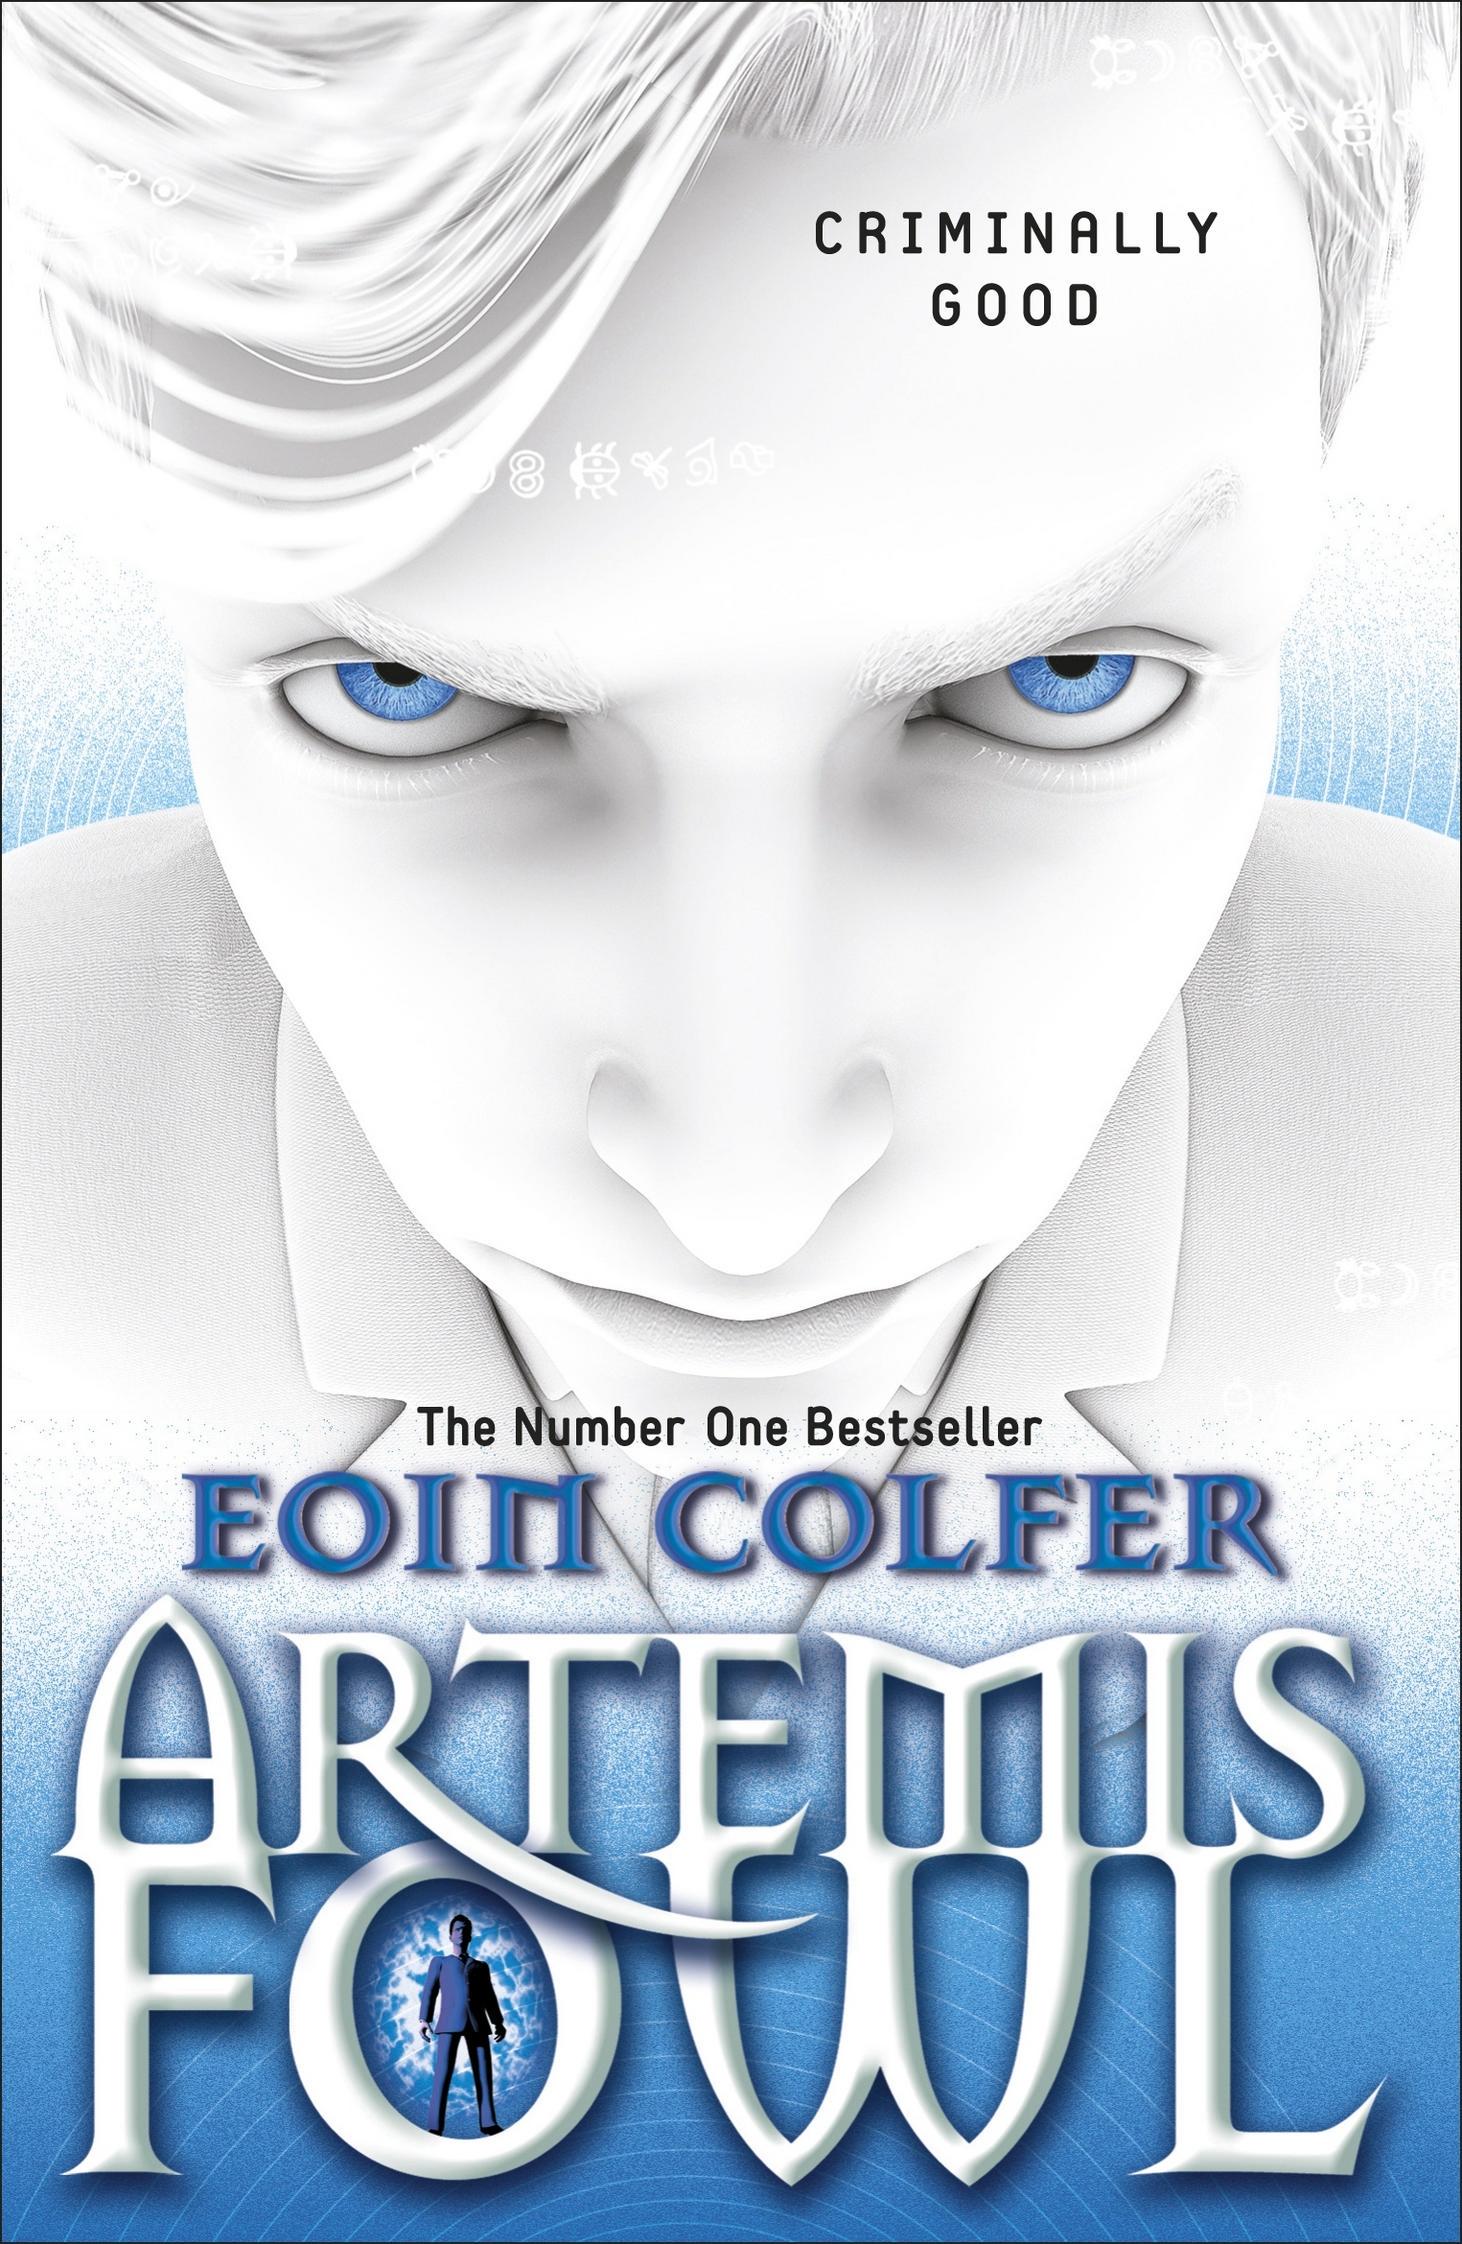 Artemis Fowl – Eoin Colfer. Reviewed by Whamo (9) – Mango ...